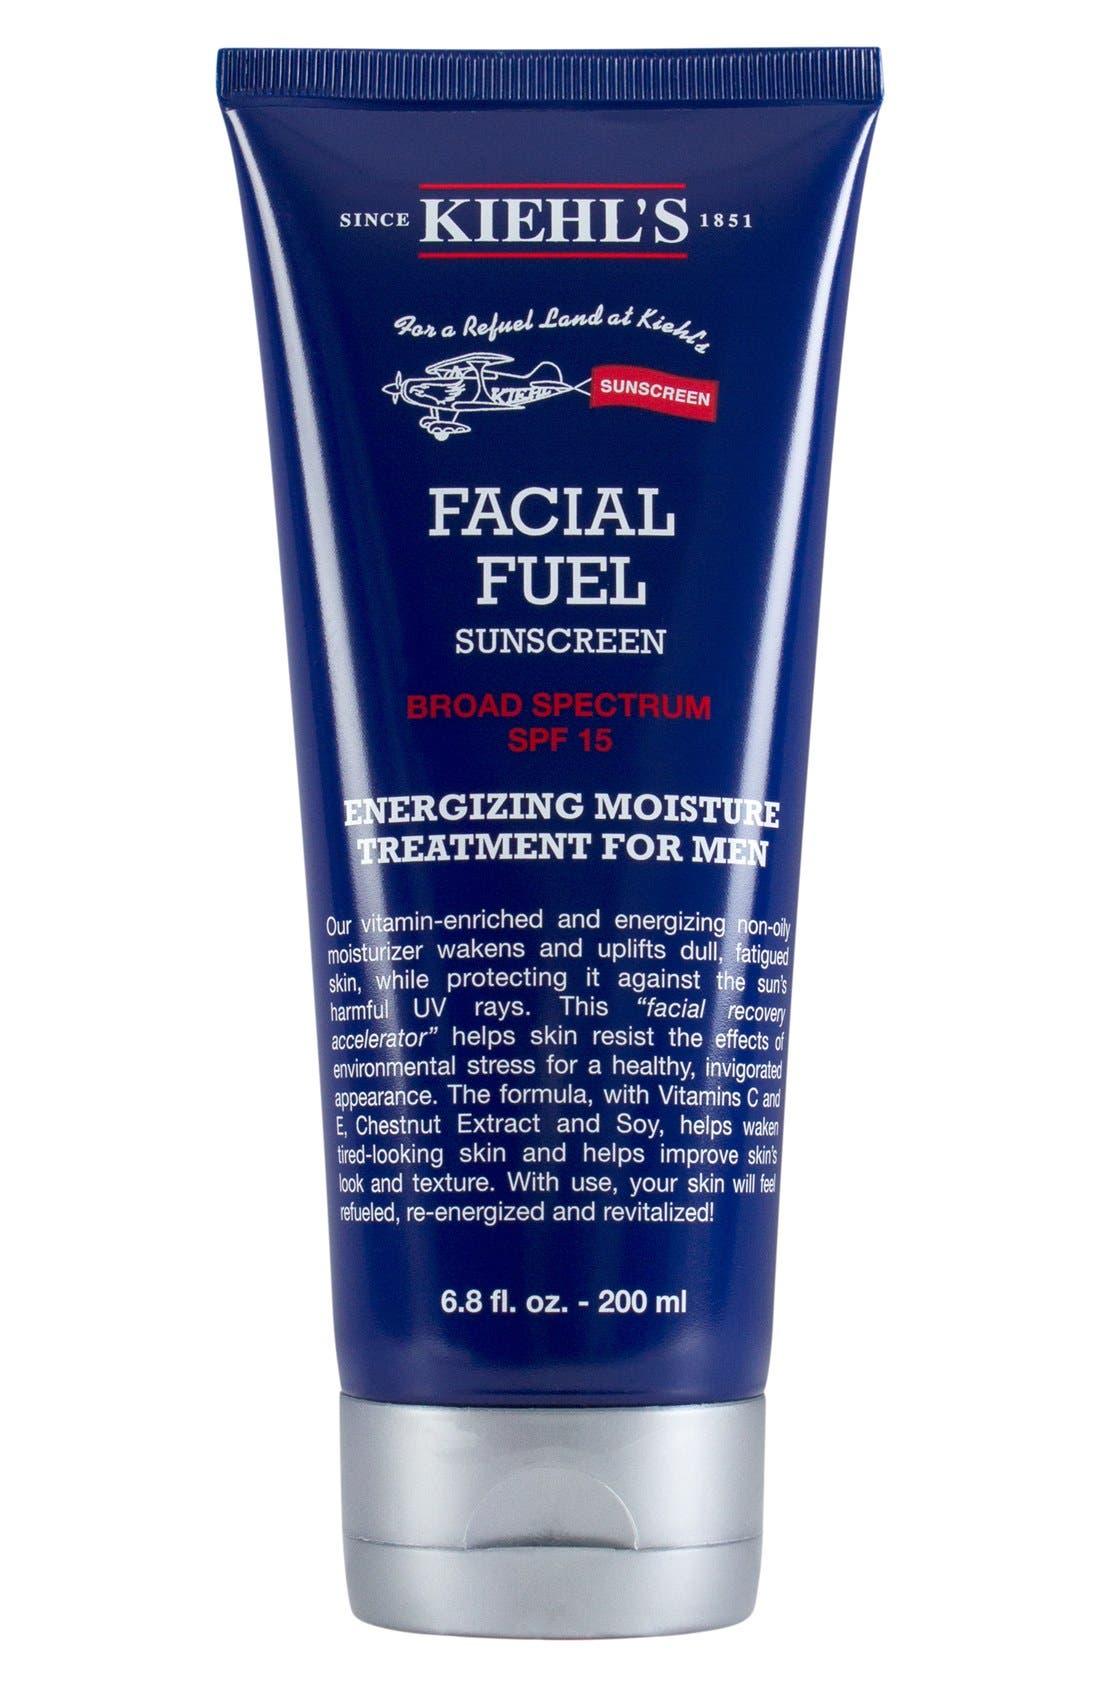 Kiehl's Since 1851 'Facial Fuel' SPF 15 Sunscreen ($53 Value)